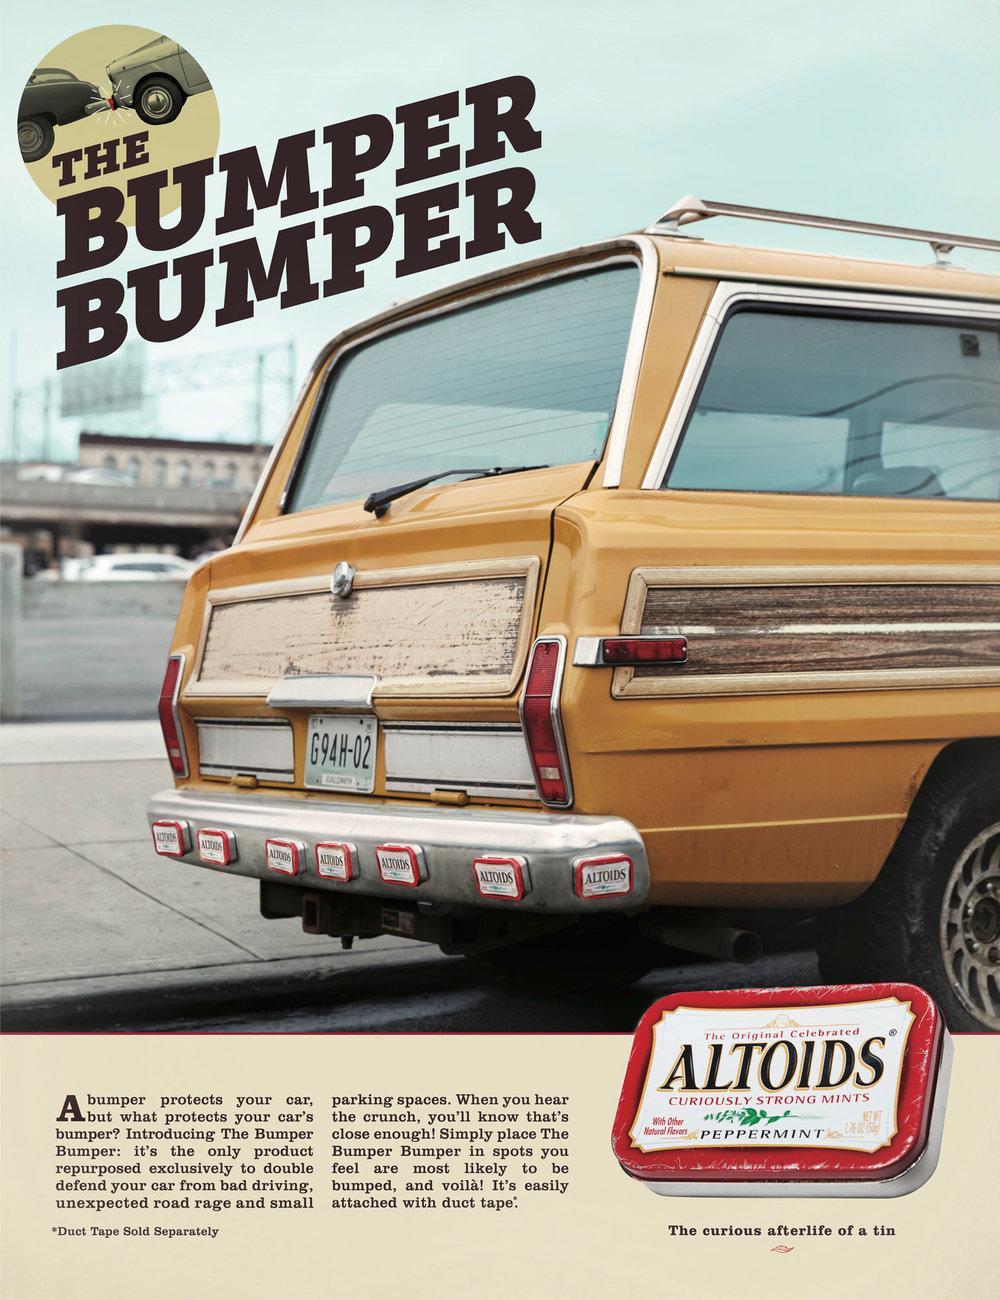 Altoids - Bumper Bumper